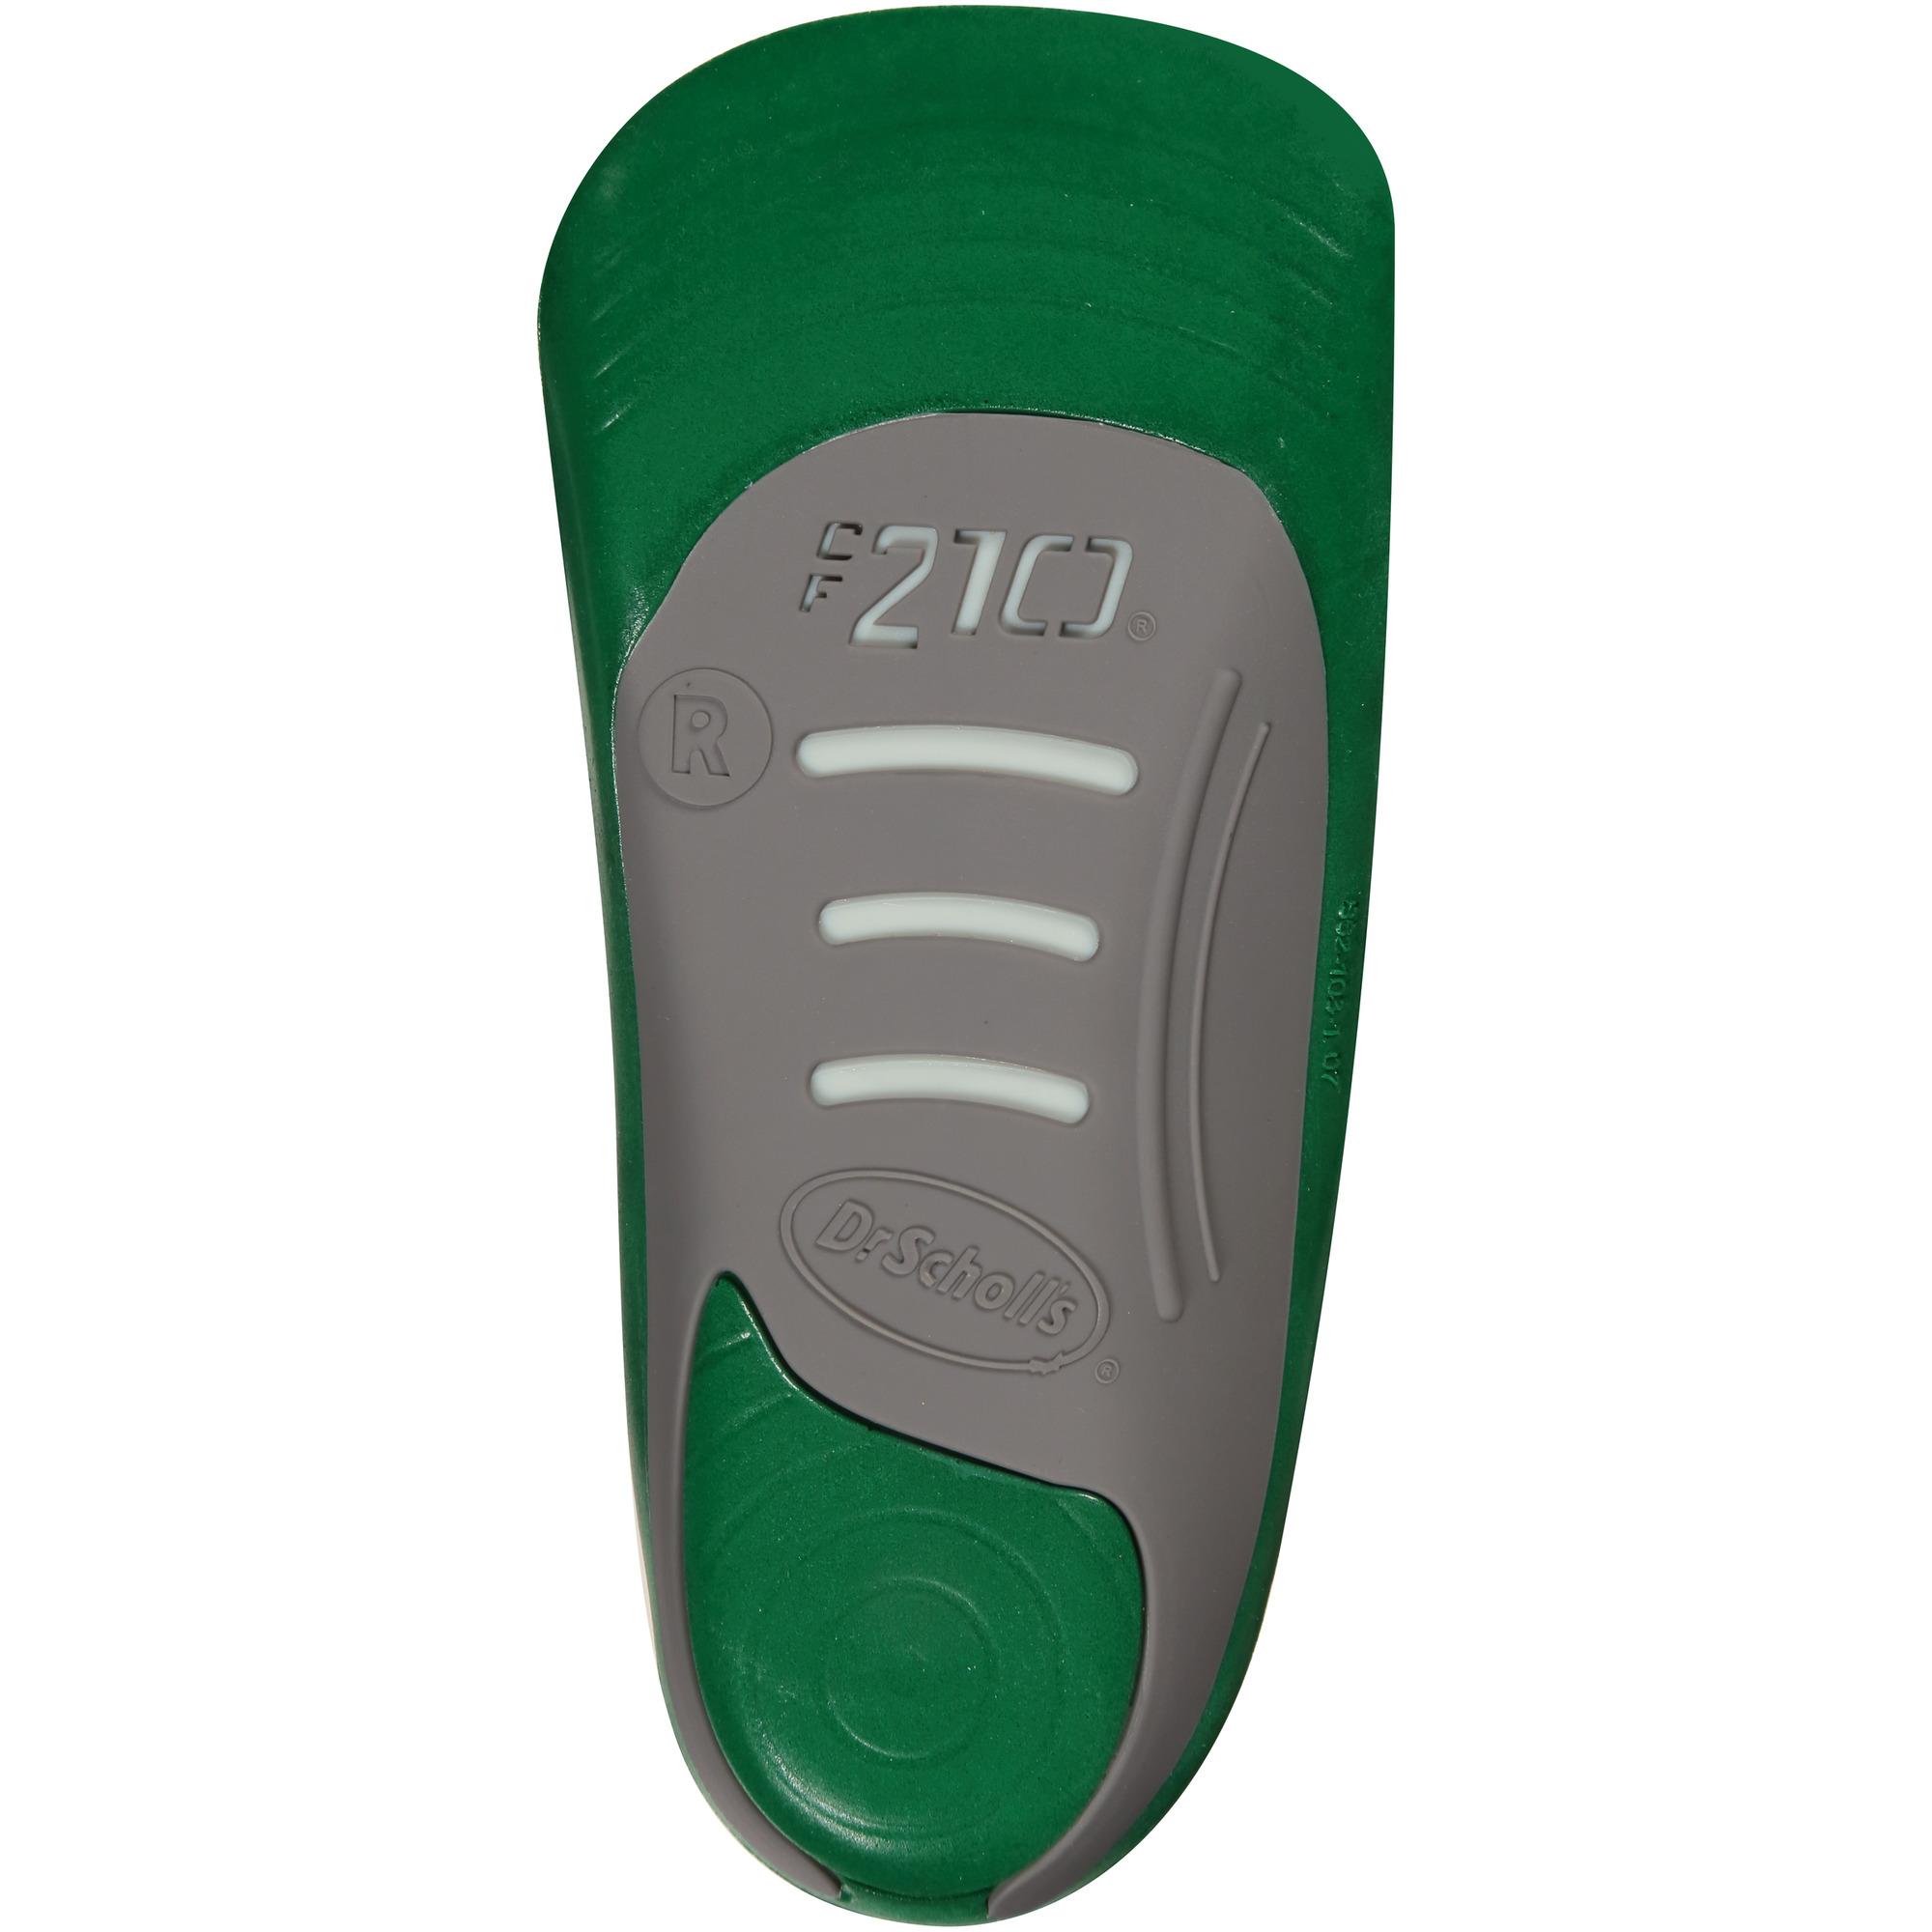 54df4a482da9 Dr. Scholl s Custom Fit Orthotic Inserts CF 210